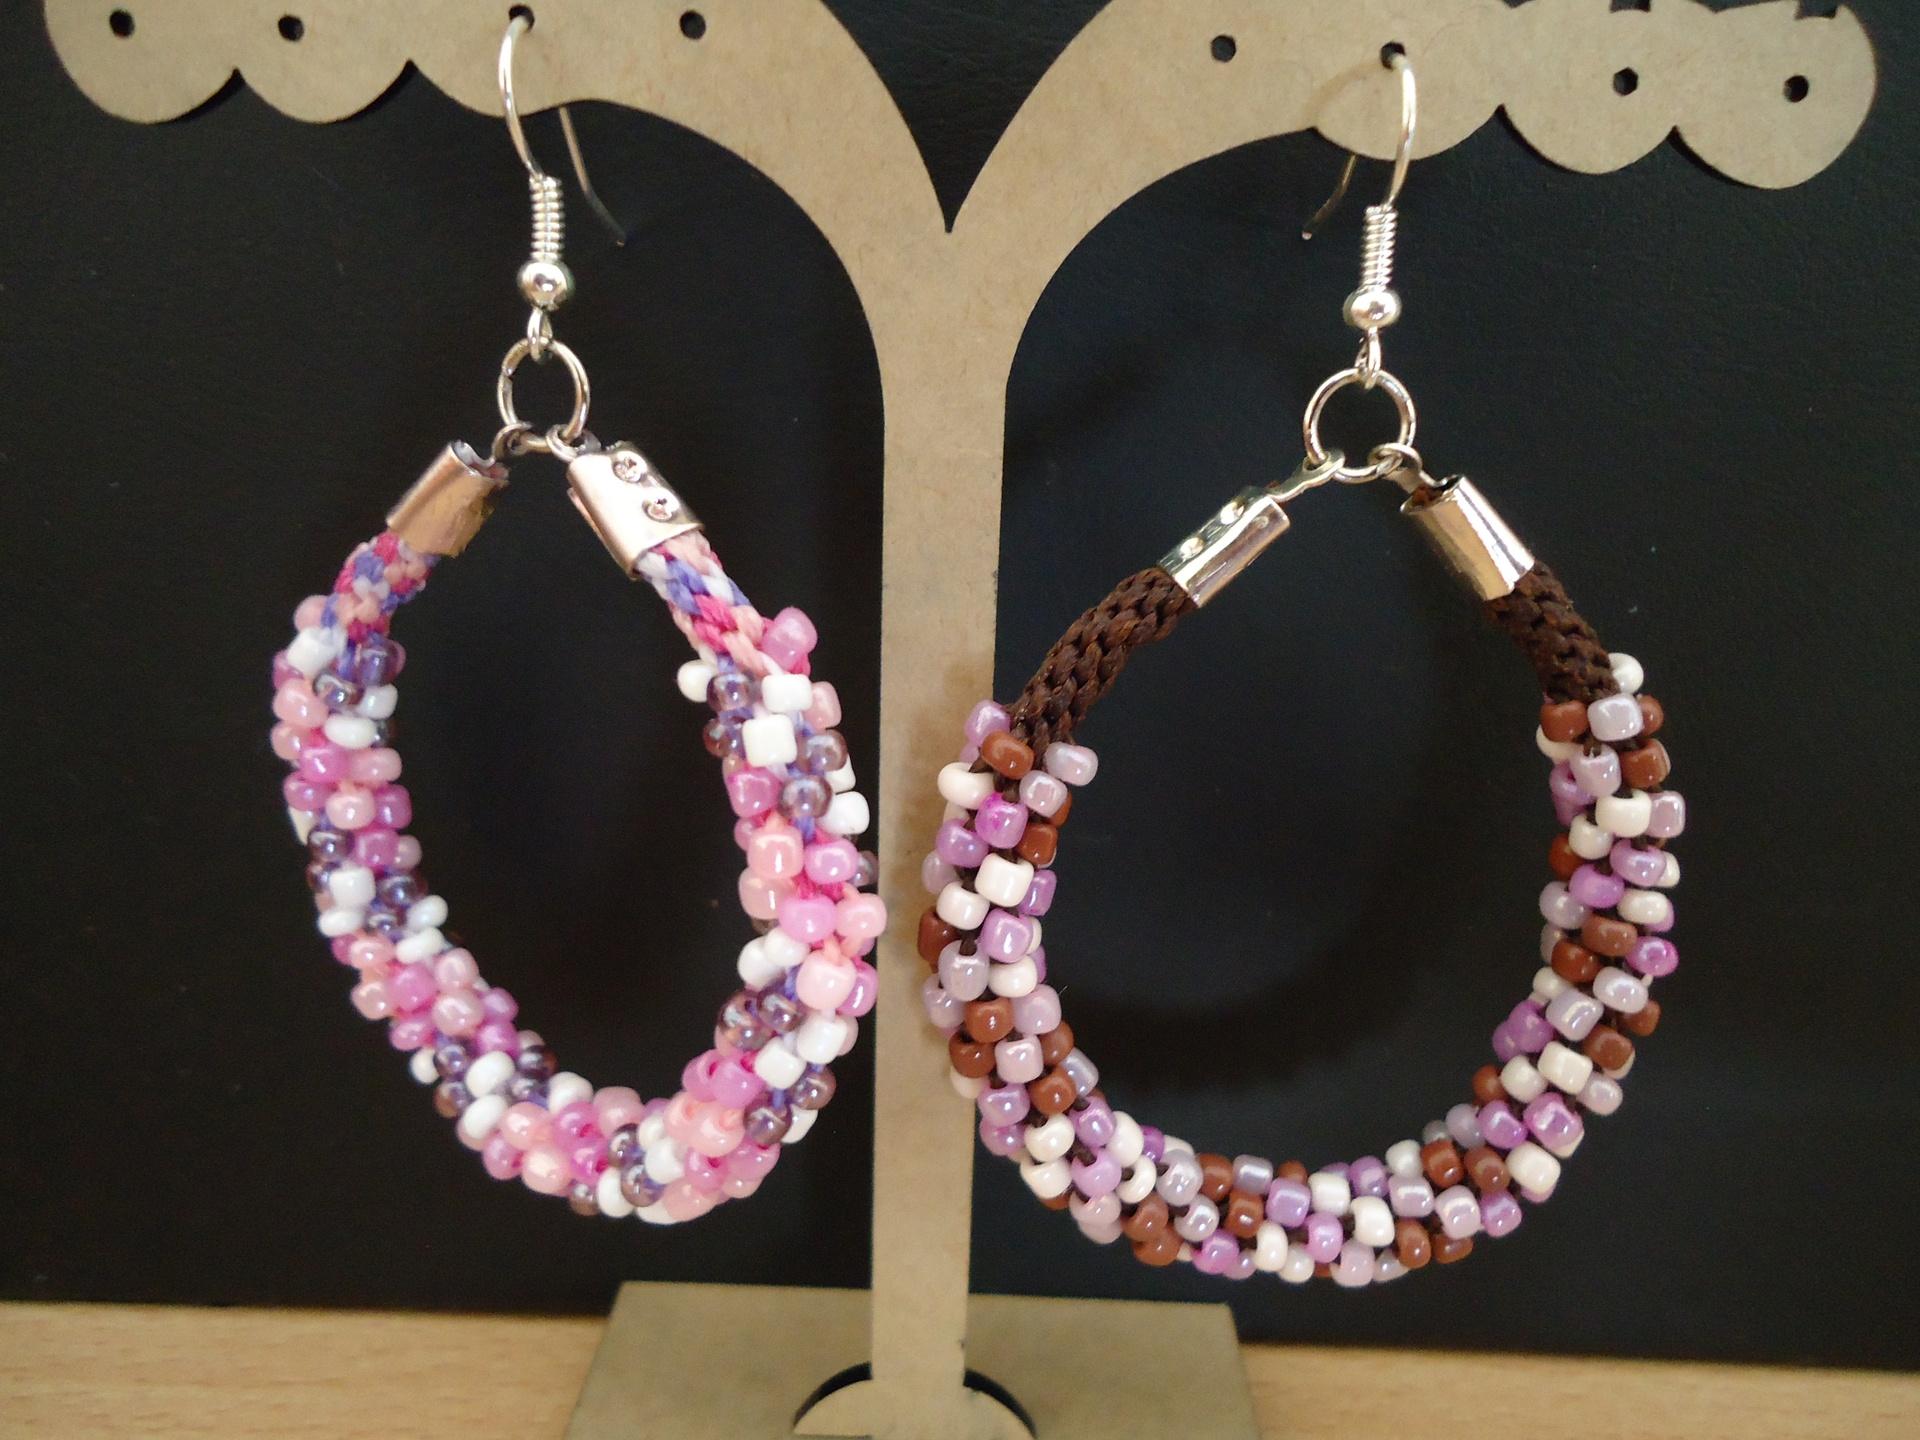 Kumihimo braided earrings (4 colors)